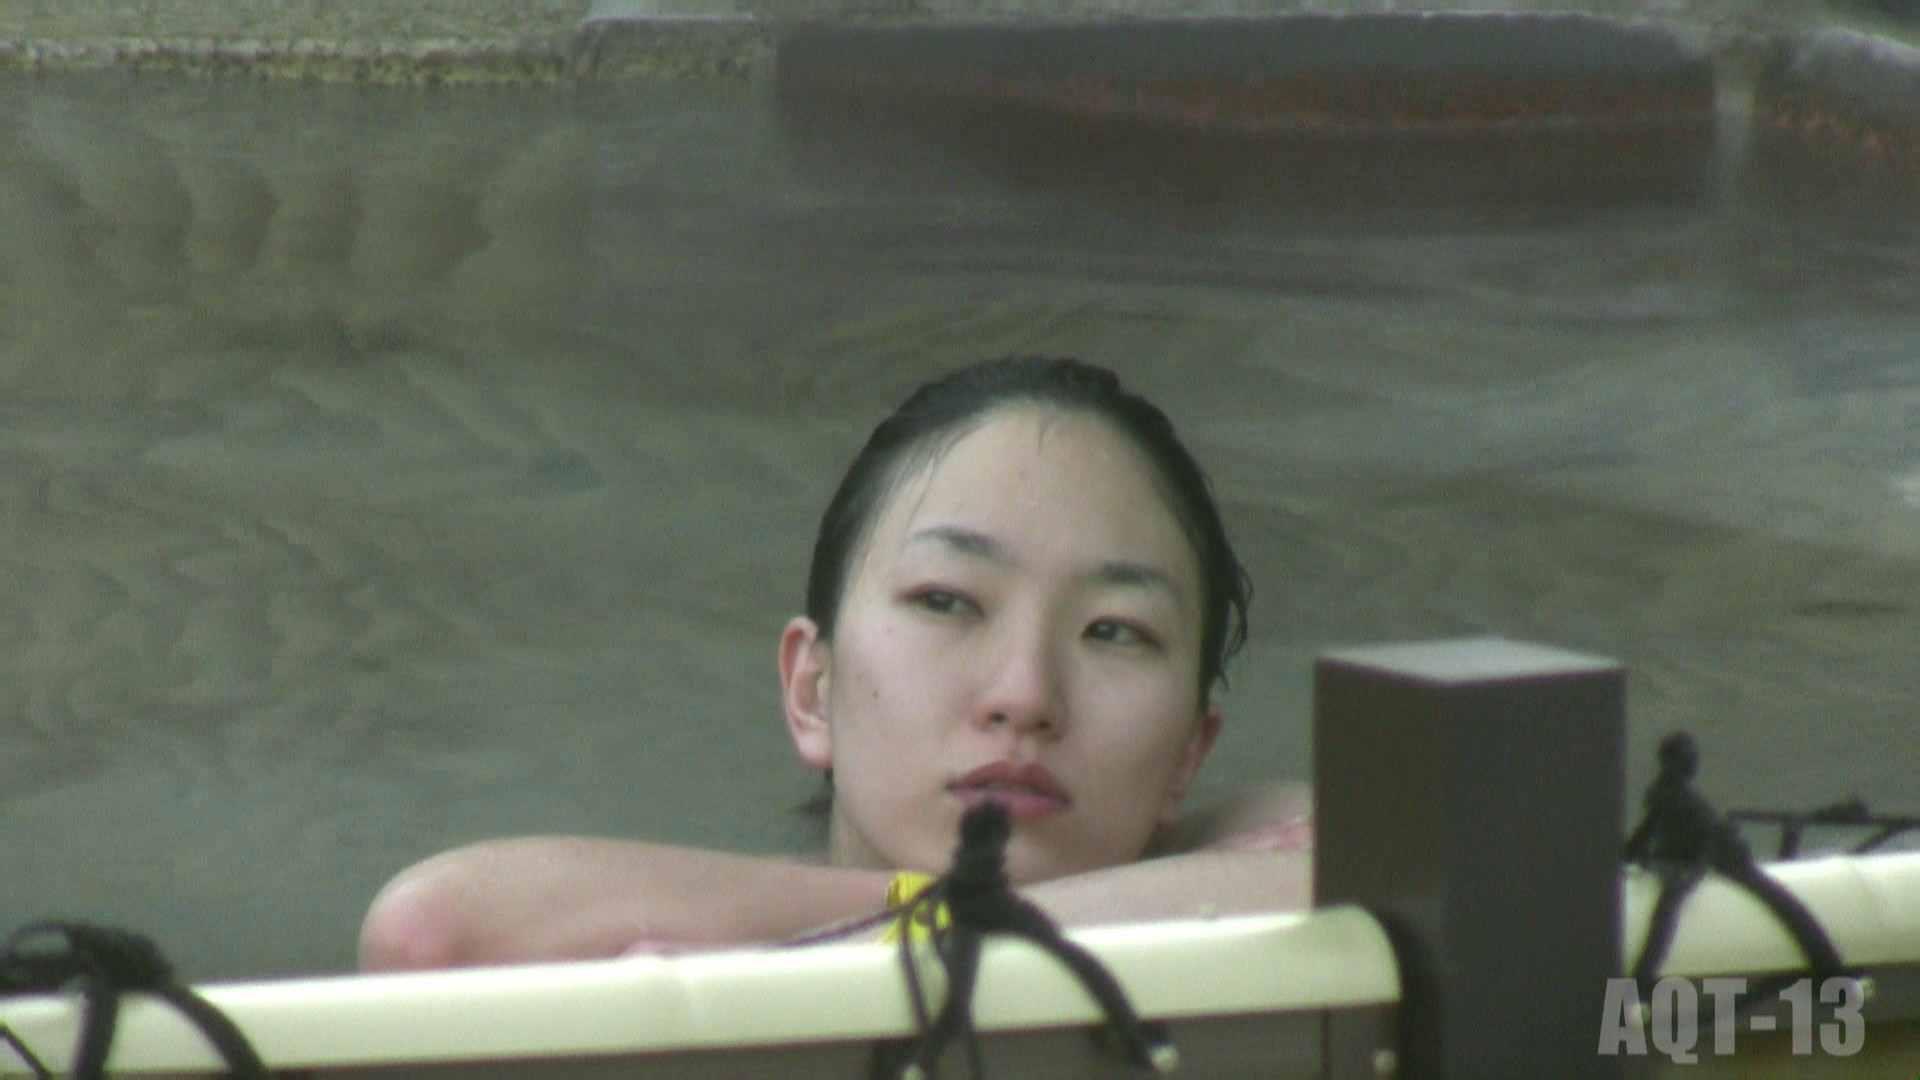 Aquaな露天風呂Vol.818 露天風呂編 | 盗撮シリーズ  93PIX 29